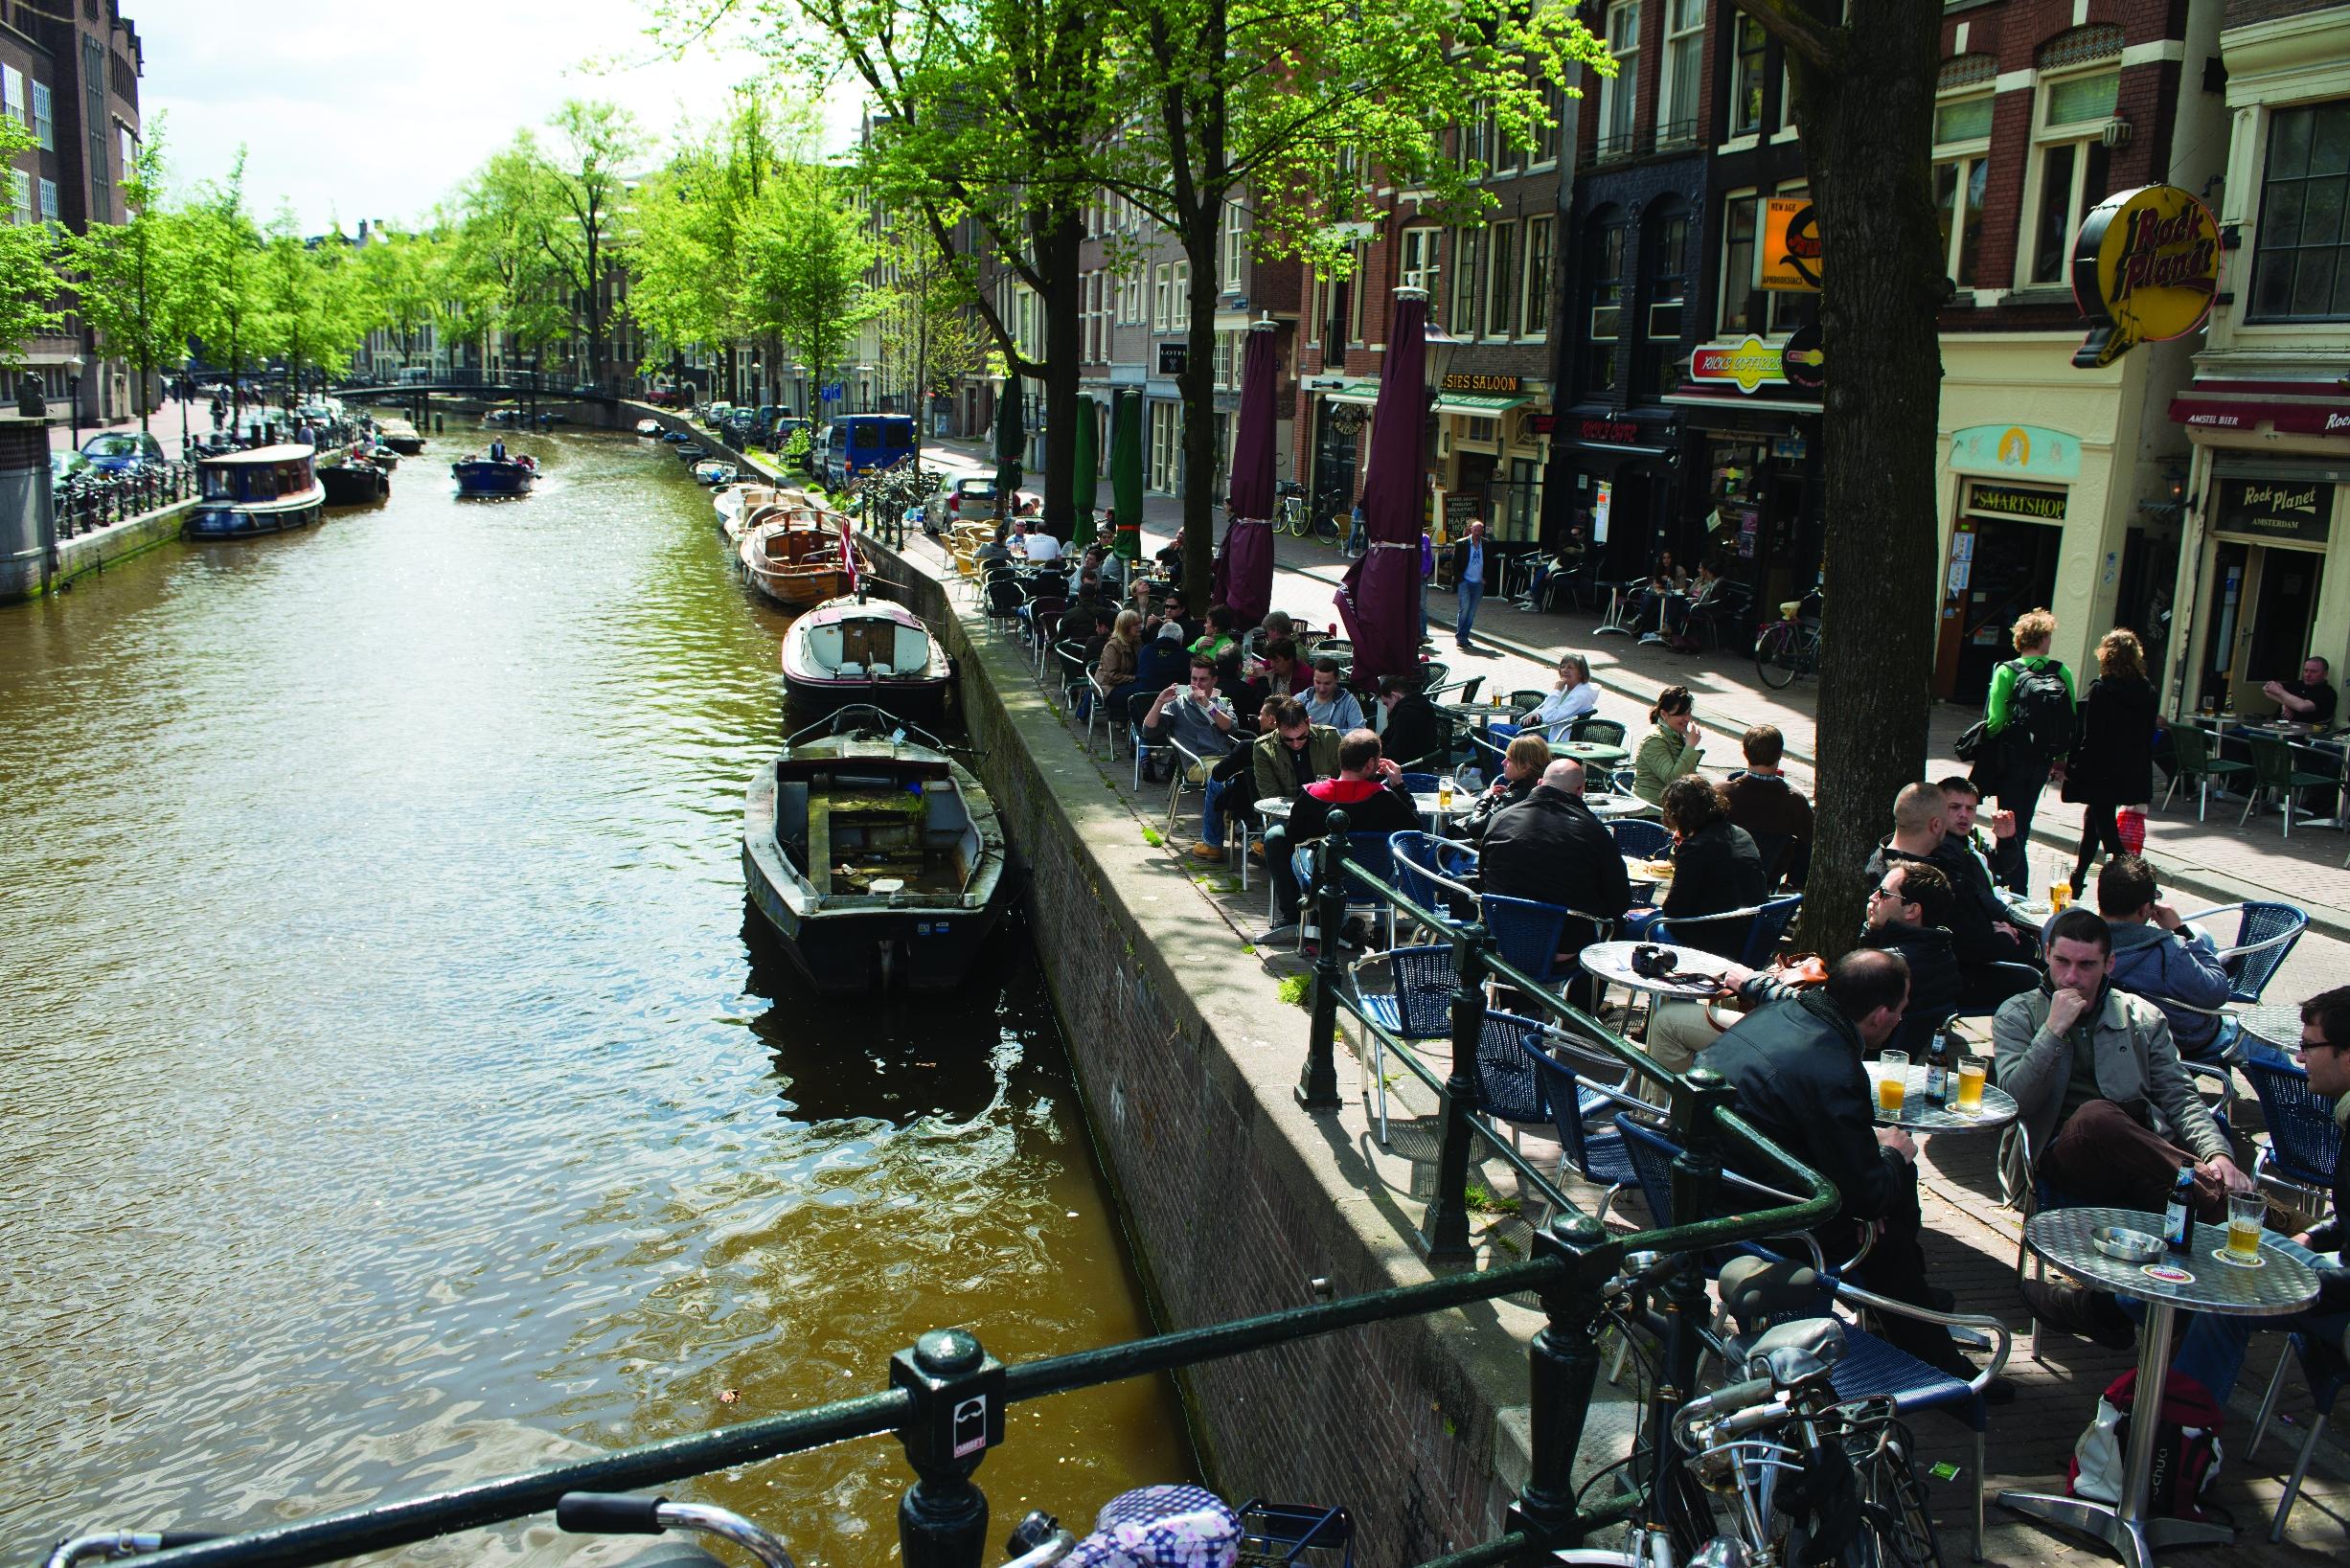 terrace-amsterdam-canals_high_rgb_3415.jpg